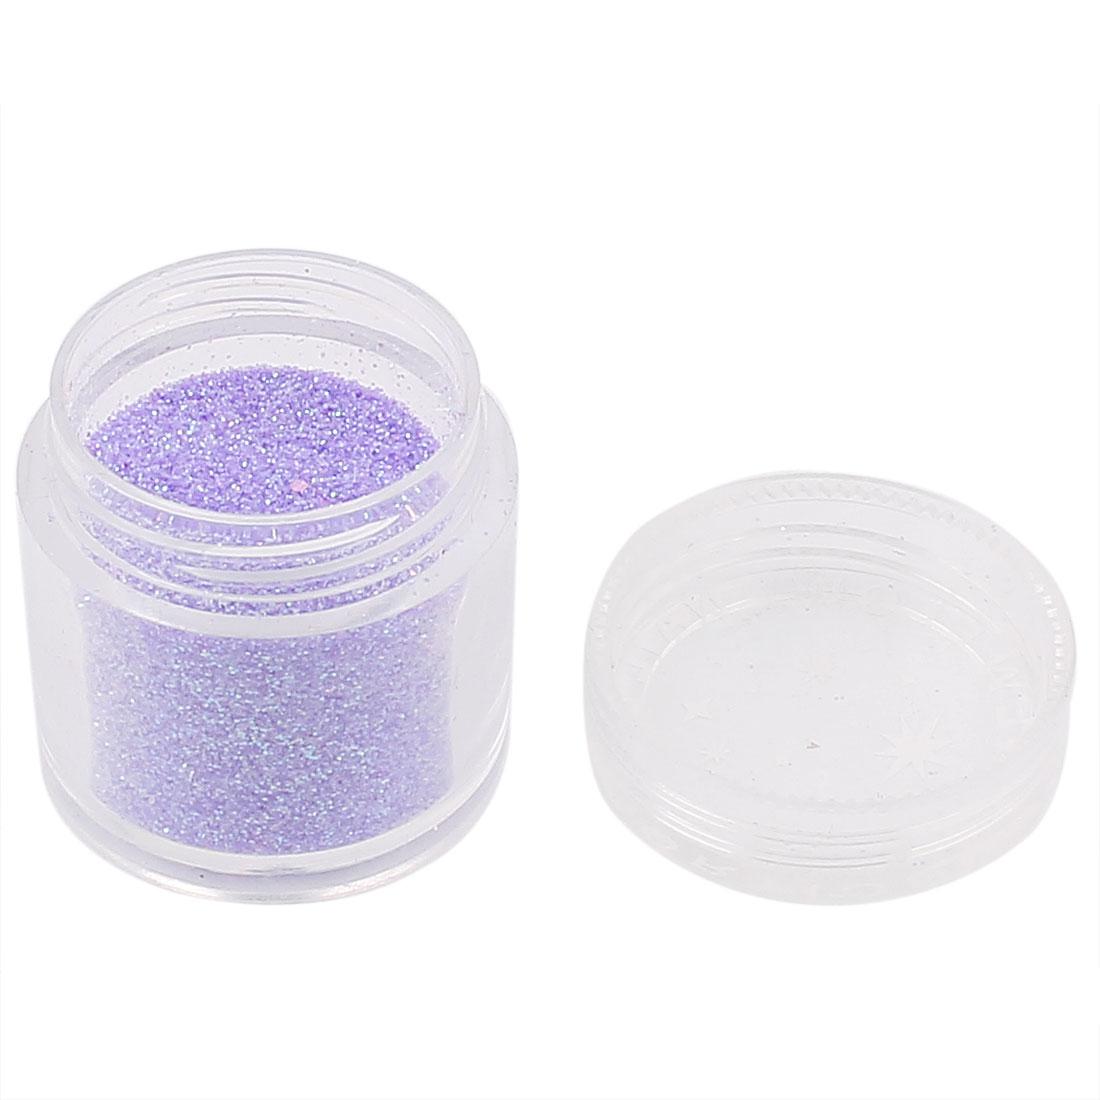 Nail Art Tips Decoration Crafts DIY Purple Tone Glitter Dust Powder Clear